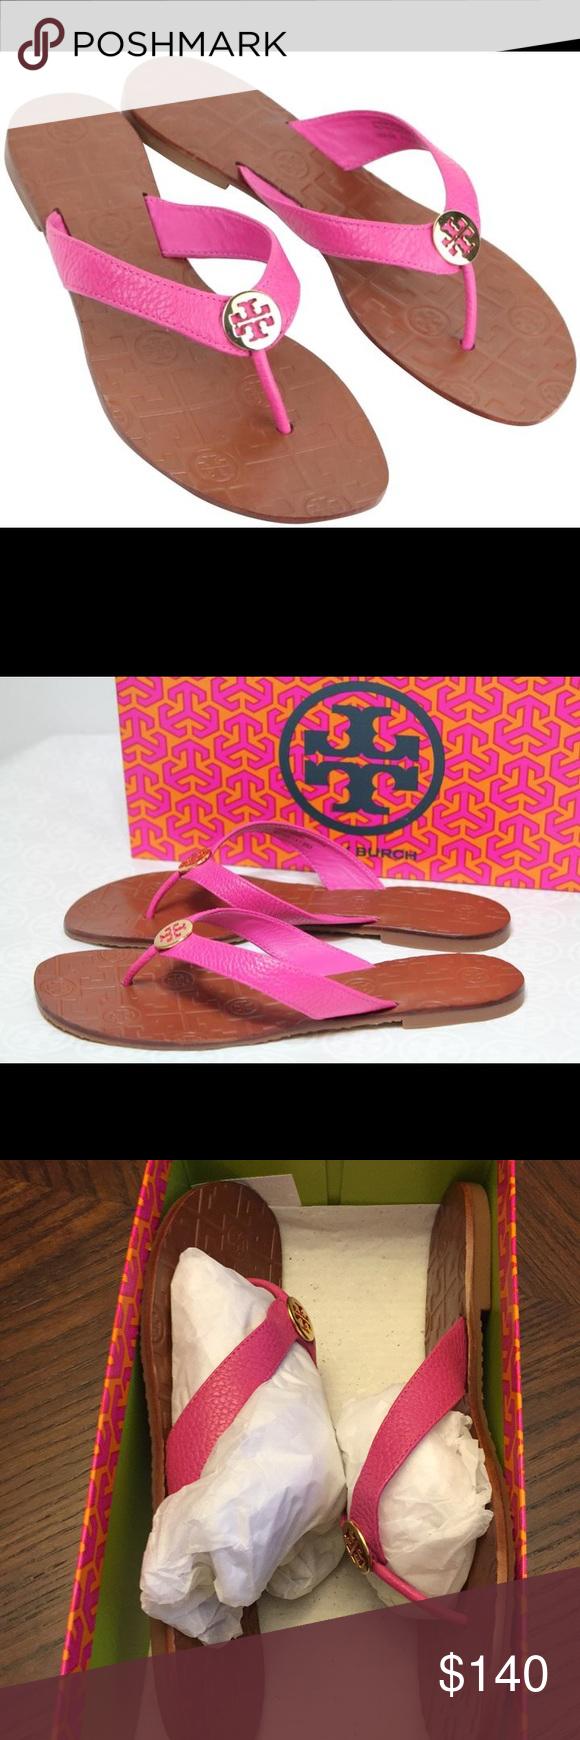 774e86e1b NEW Tory Burch Thora Tumbled Leather Sandals🌟 New in box Tory Burch Thora  Tumbled Leather Thong Sandals